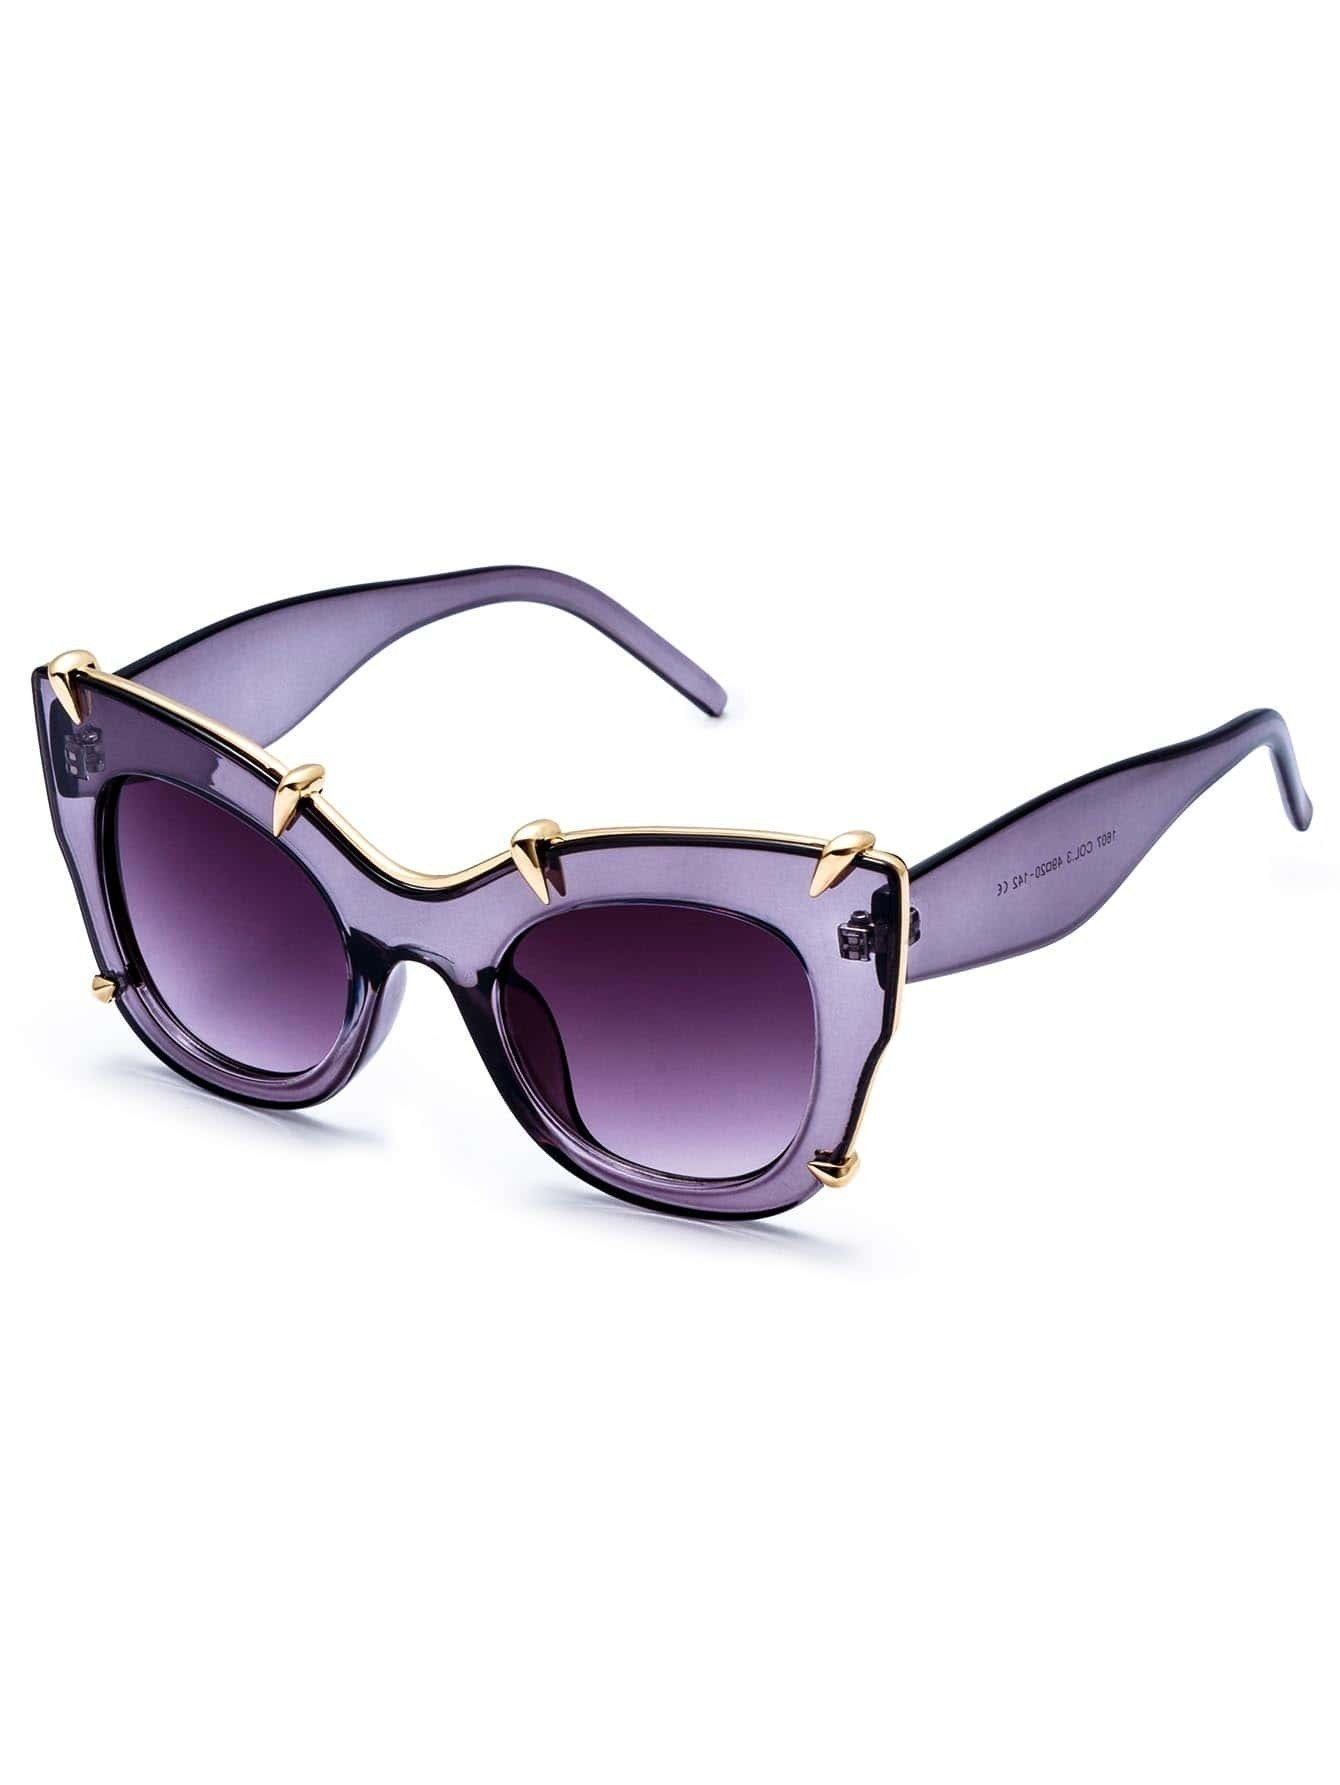 Gold Frame Cat Eye Sunglasses : Purple Clear Frame Gold Trim Cat Eye Sunglasses